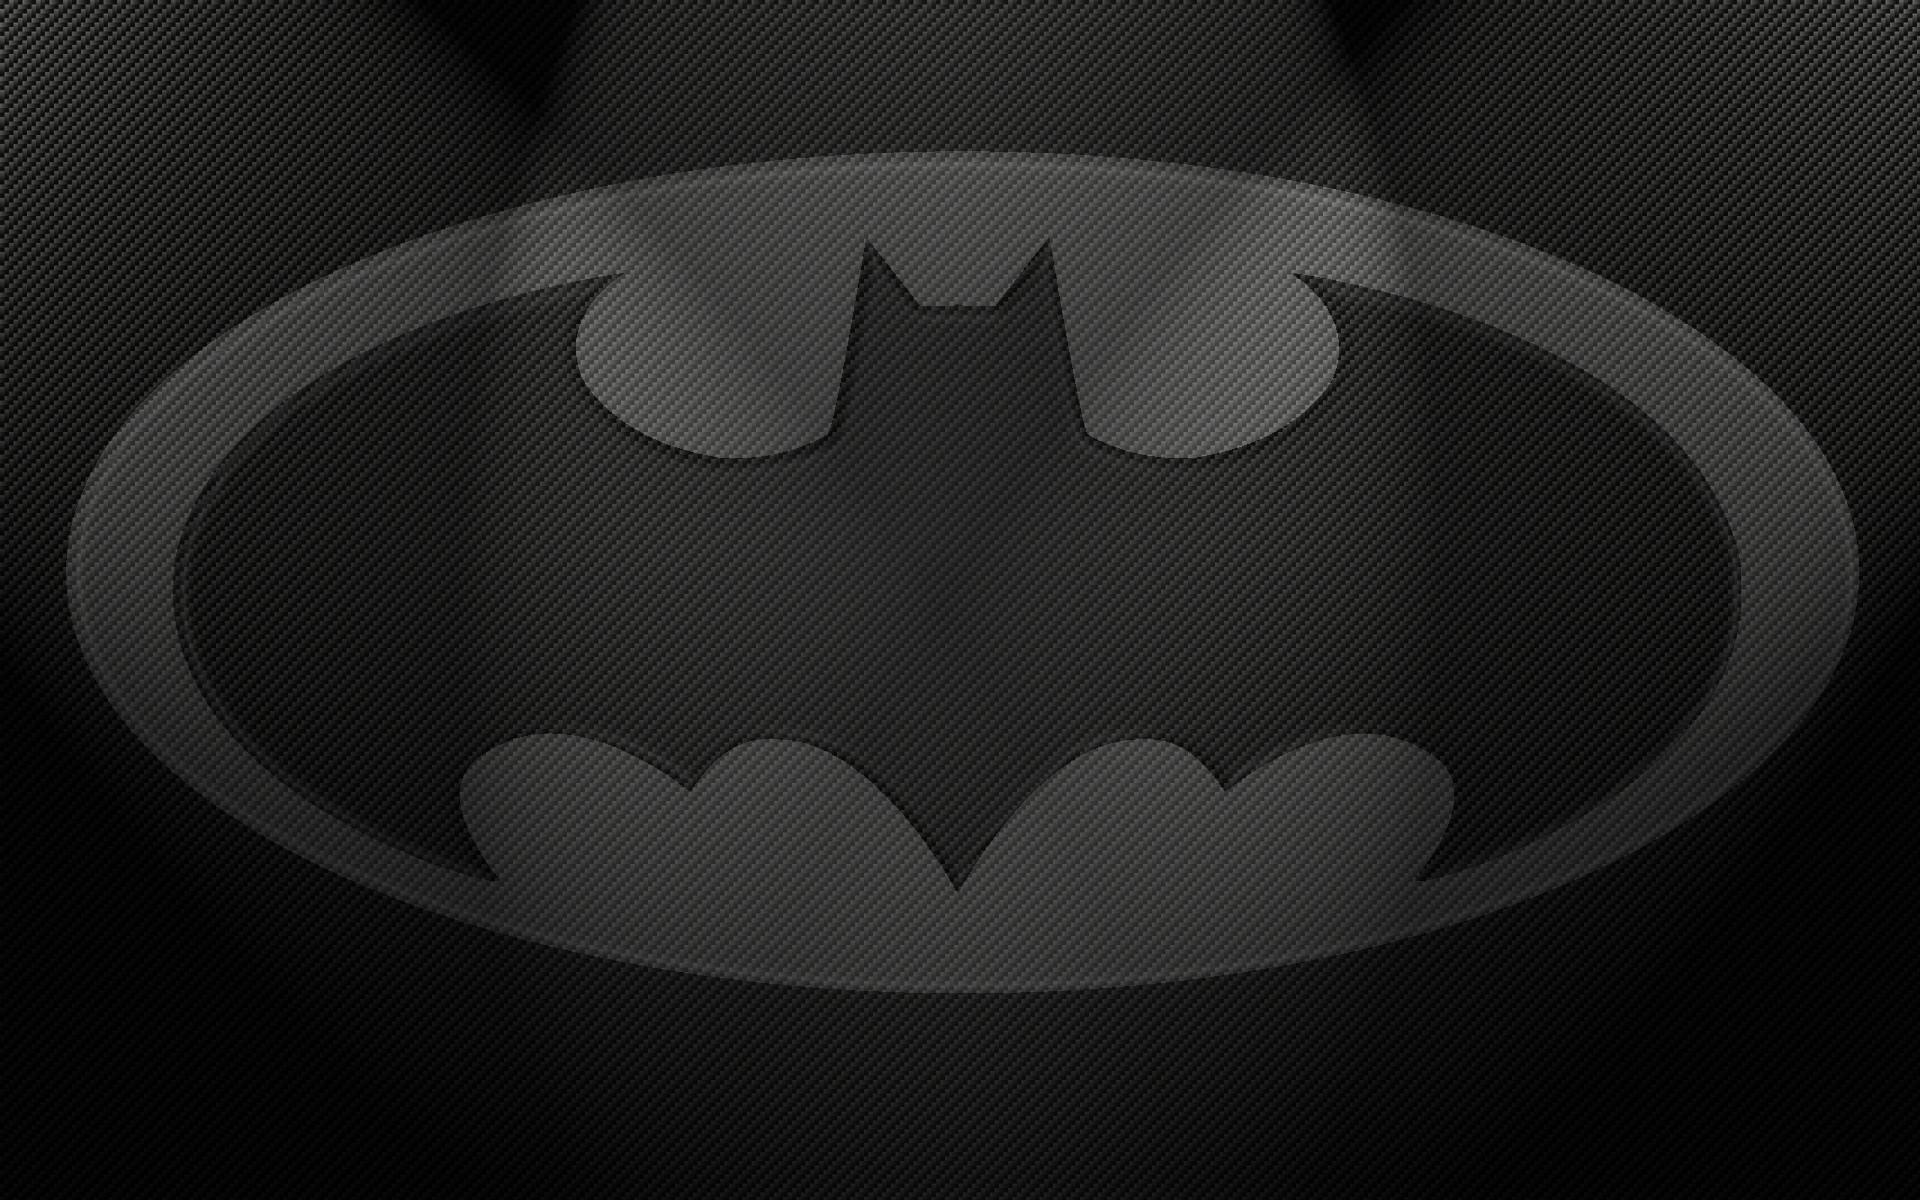 Batman – Carbon Fiber by crazySmiley on DeviantArt